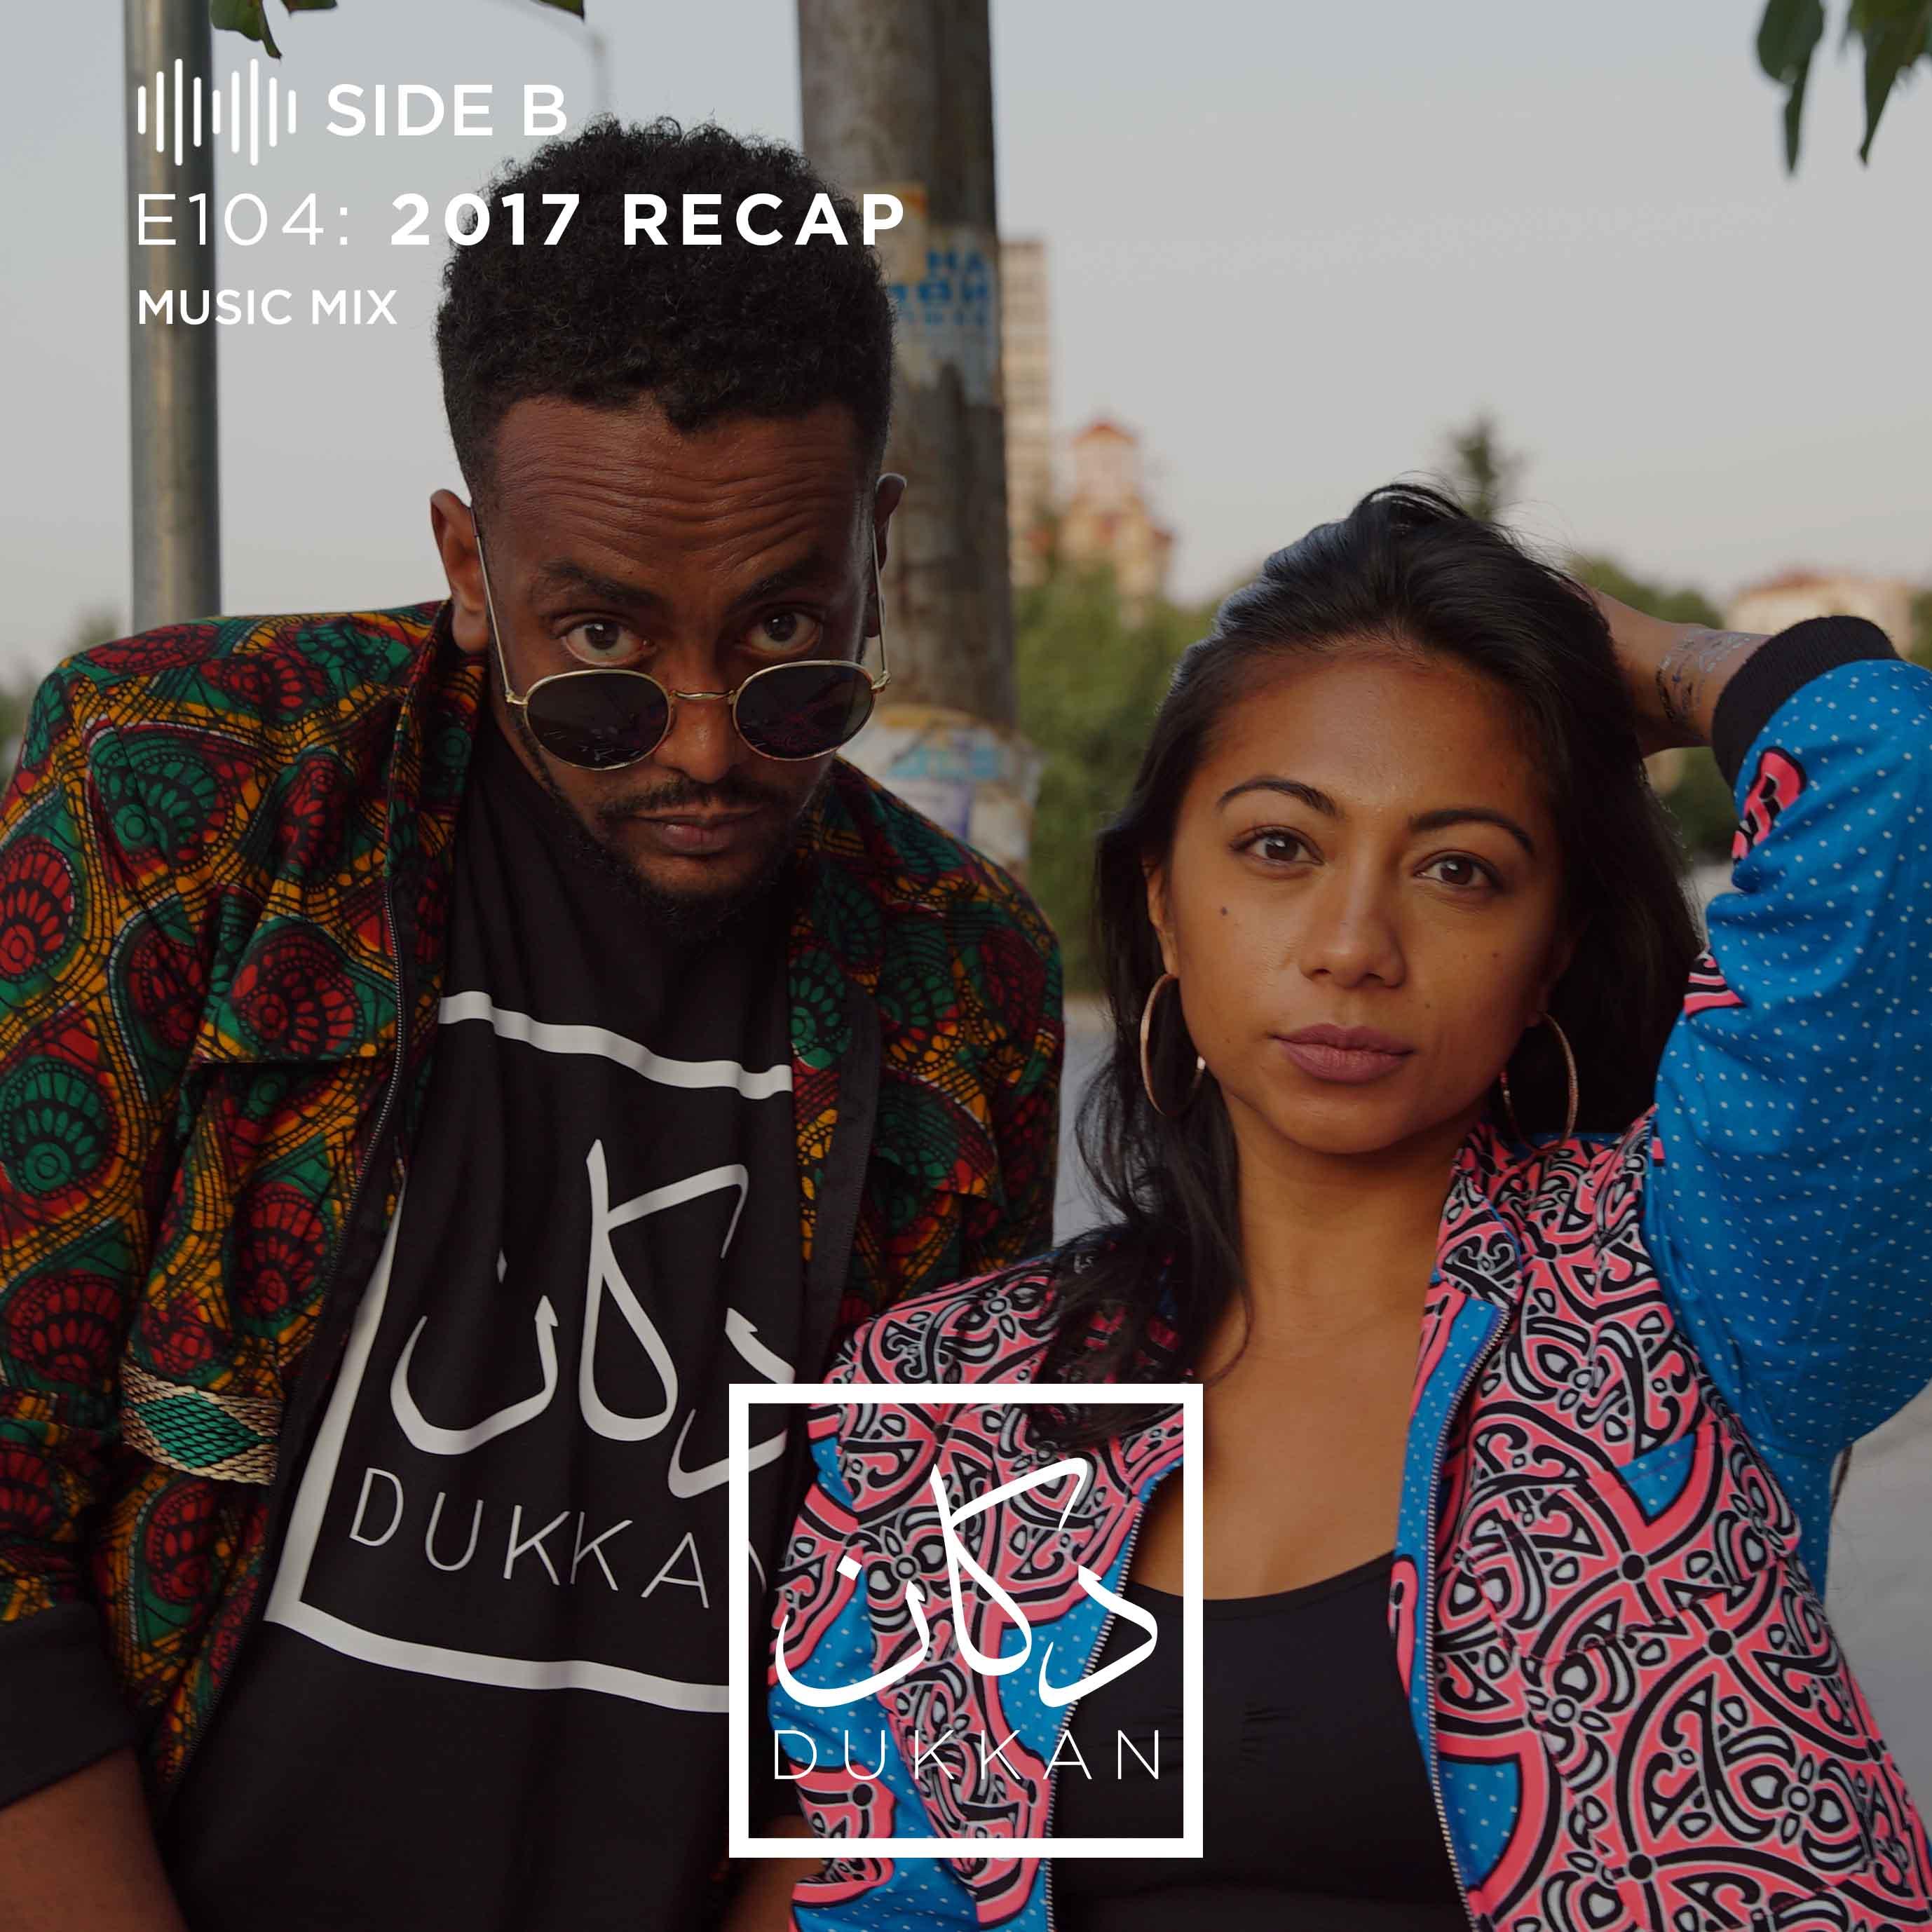 E104 - Side B: 2017 Recap (Music Mix)